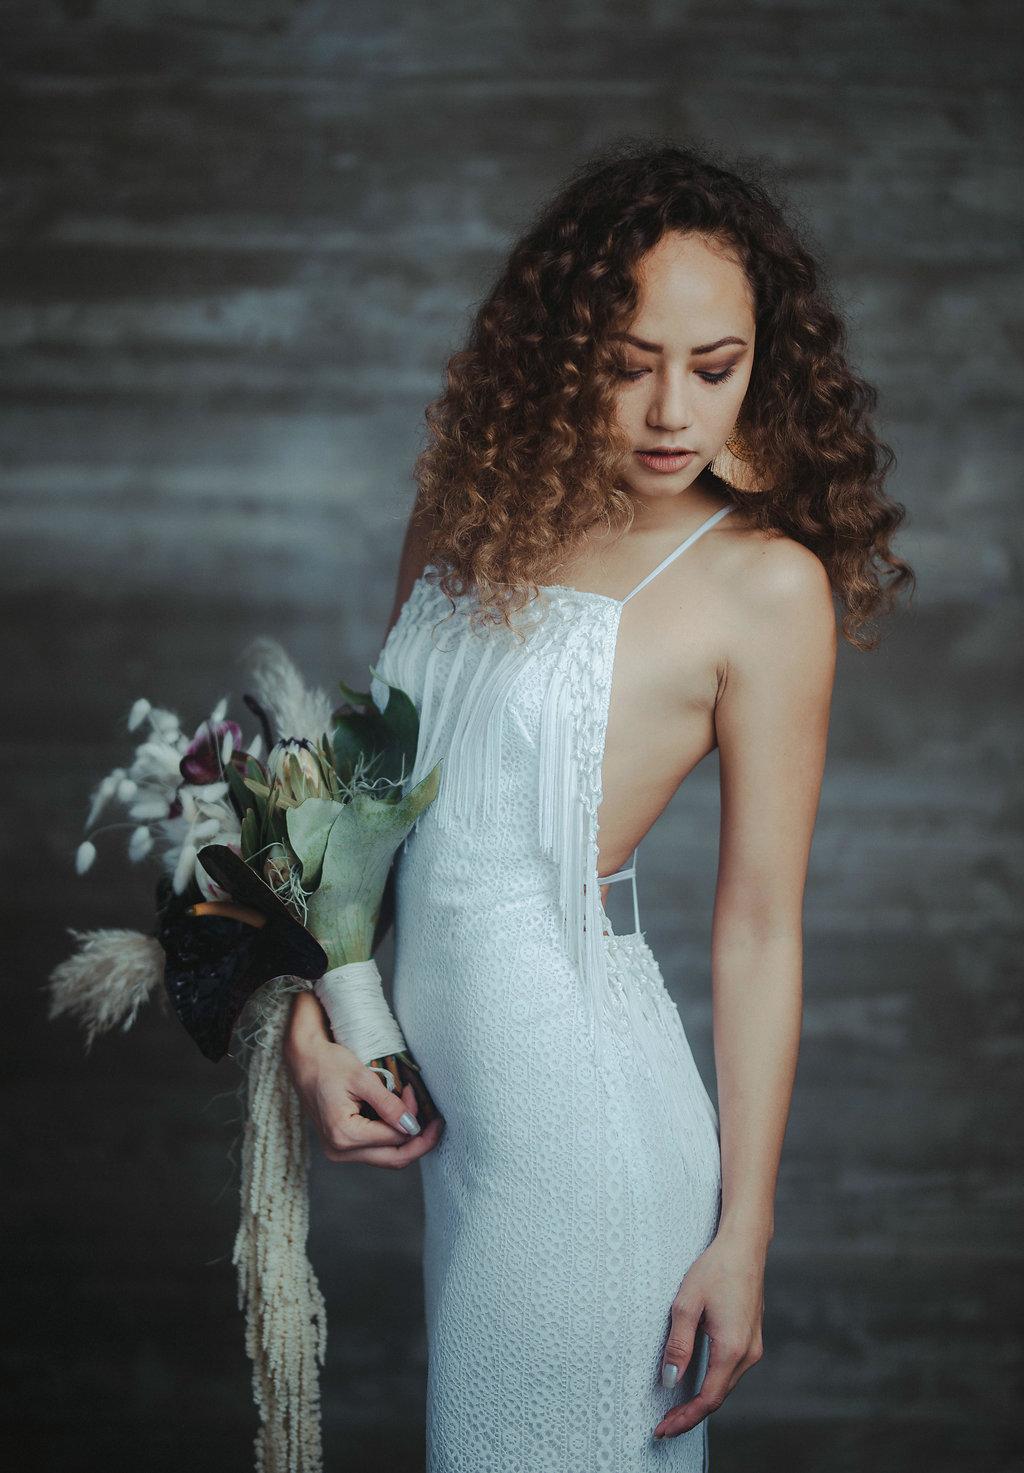 Crredits: Flowers: @bluekaidesigns Photographer: @couplecups Luna gown: @gypsybride Hair and MUA: @andikimiko_ Model: @lei.lilium